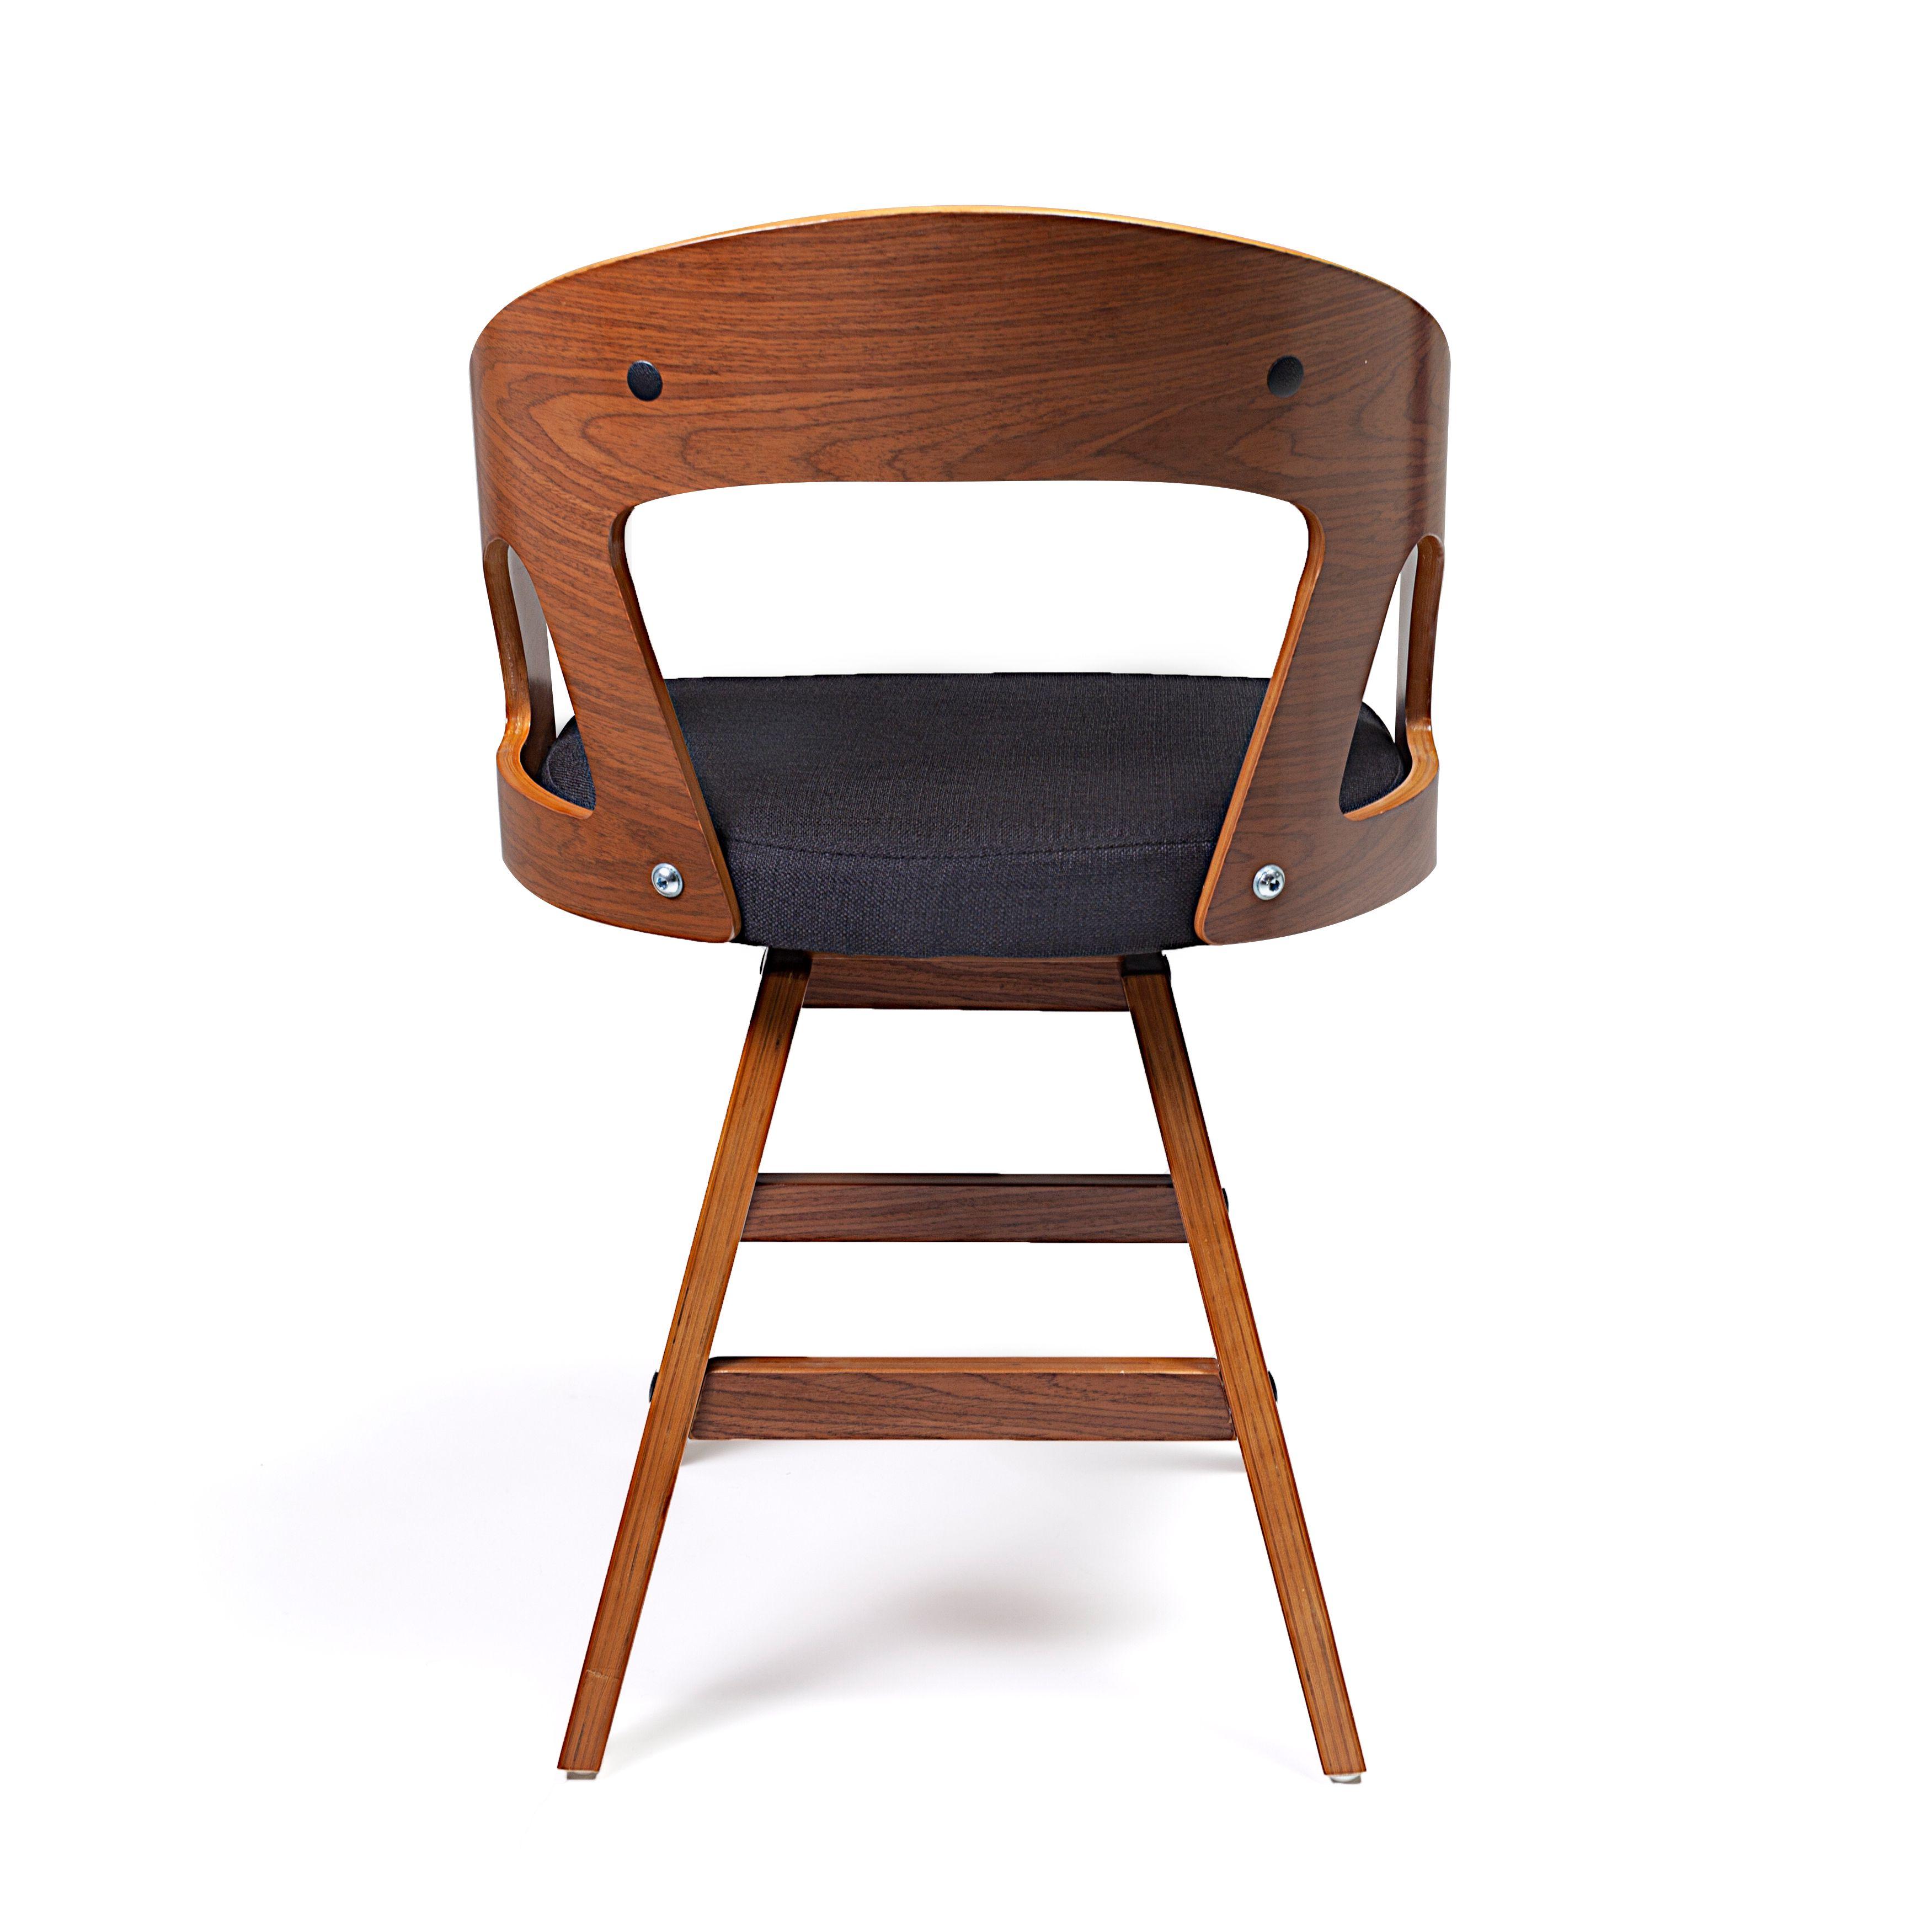 Stoel Jammerbugt - Donkergrijs/Walnoot - LiL Design